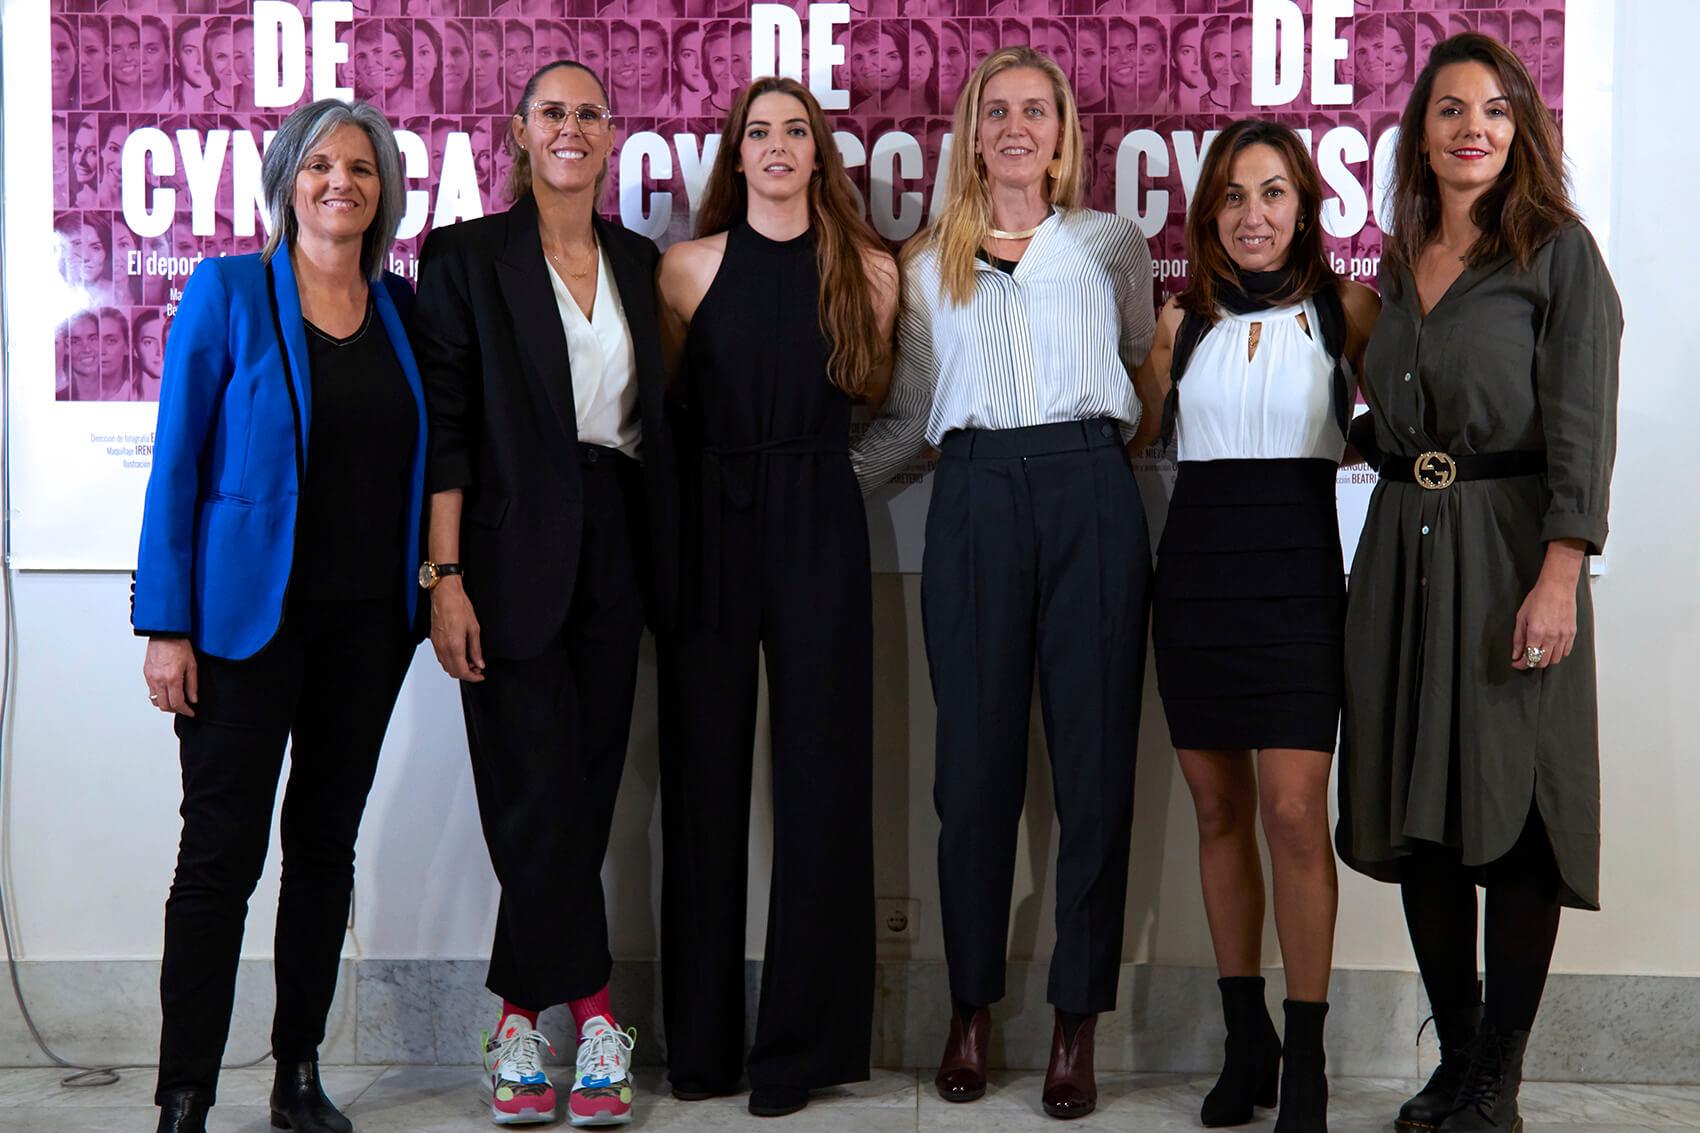 Laura Torvisco, Amaya Valdemoro, Mary Álvarez del Burgo, Paula Tirini, Dori Ruano y Bea Fernández